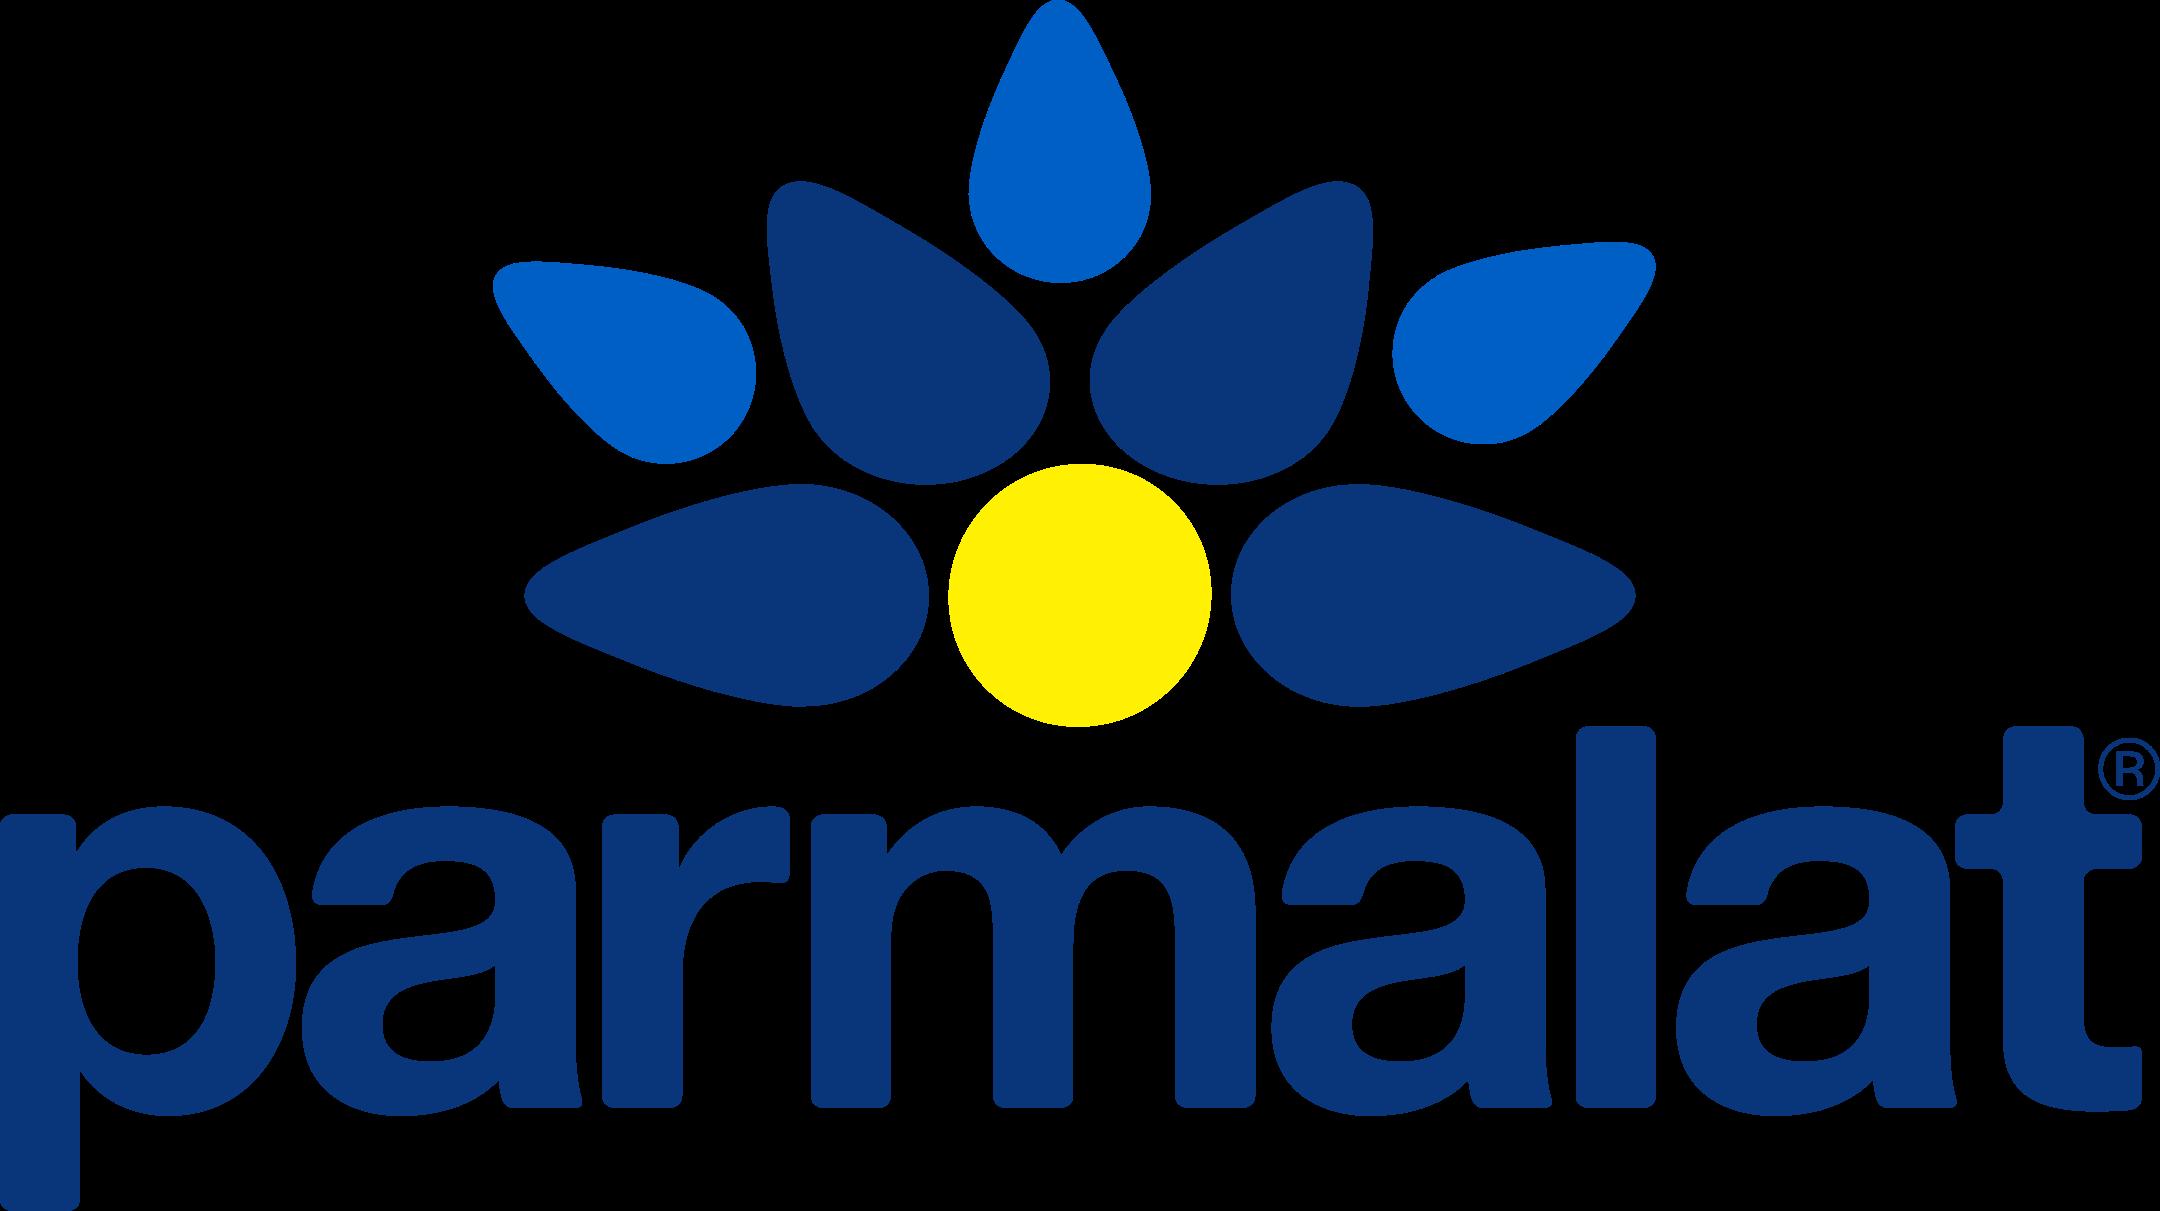 parmalat logo 1 - Parmalat Logo